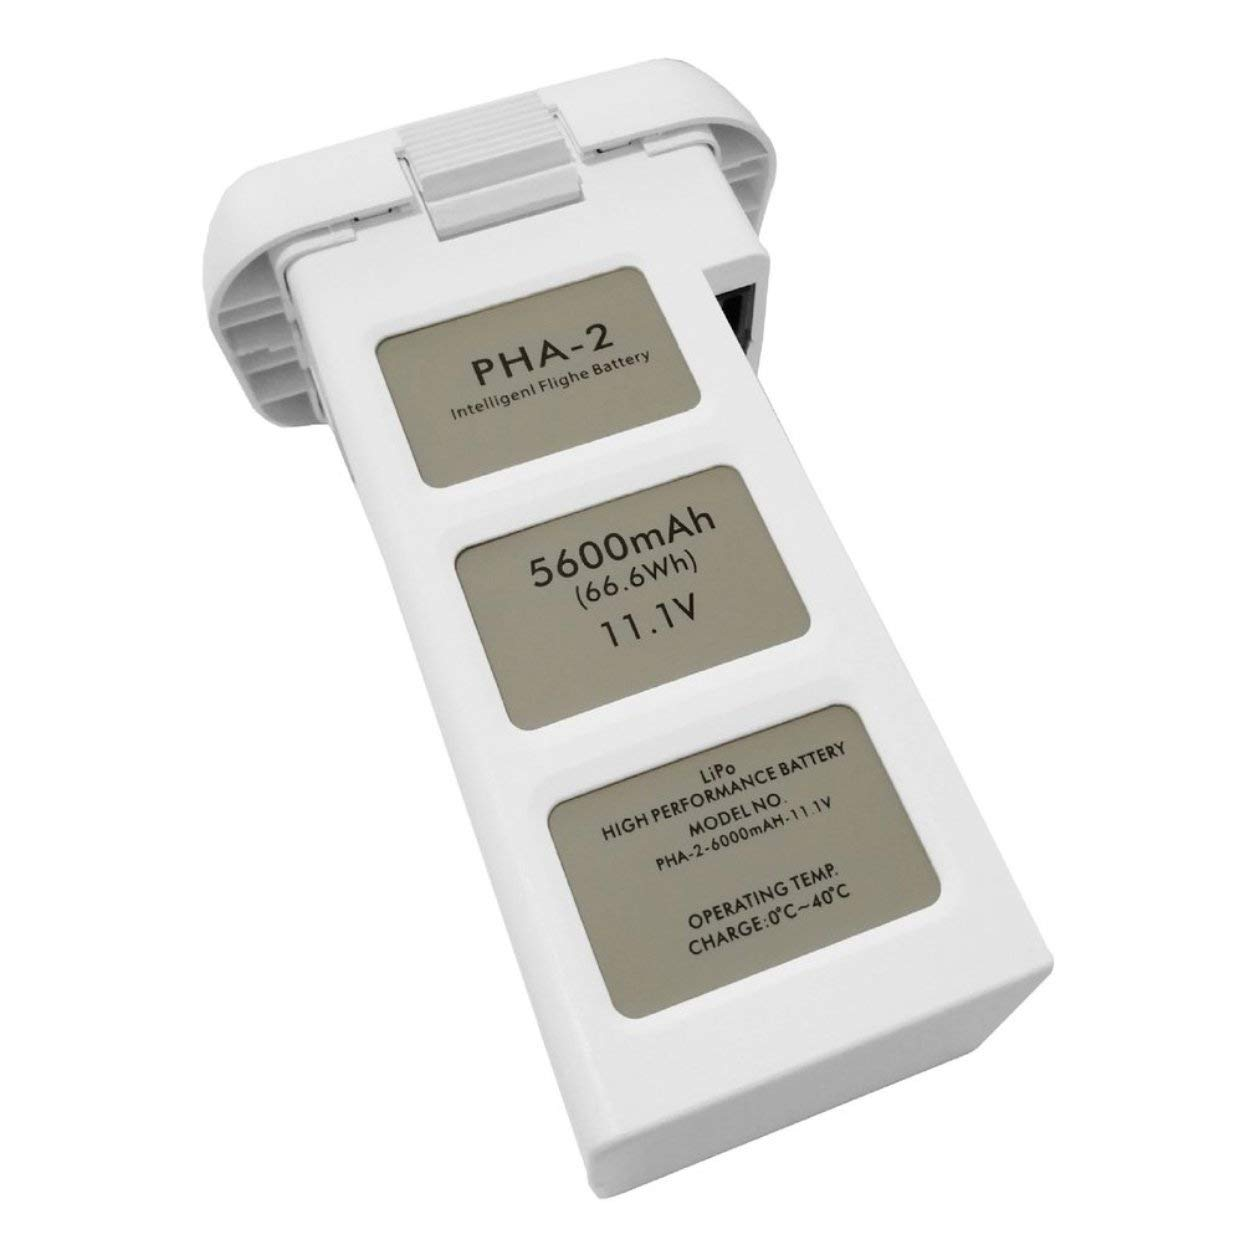 5600mAh intelligente Flugbatterie für DJI Phantom 2 für DJI Phantom 2 Vision +